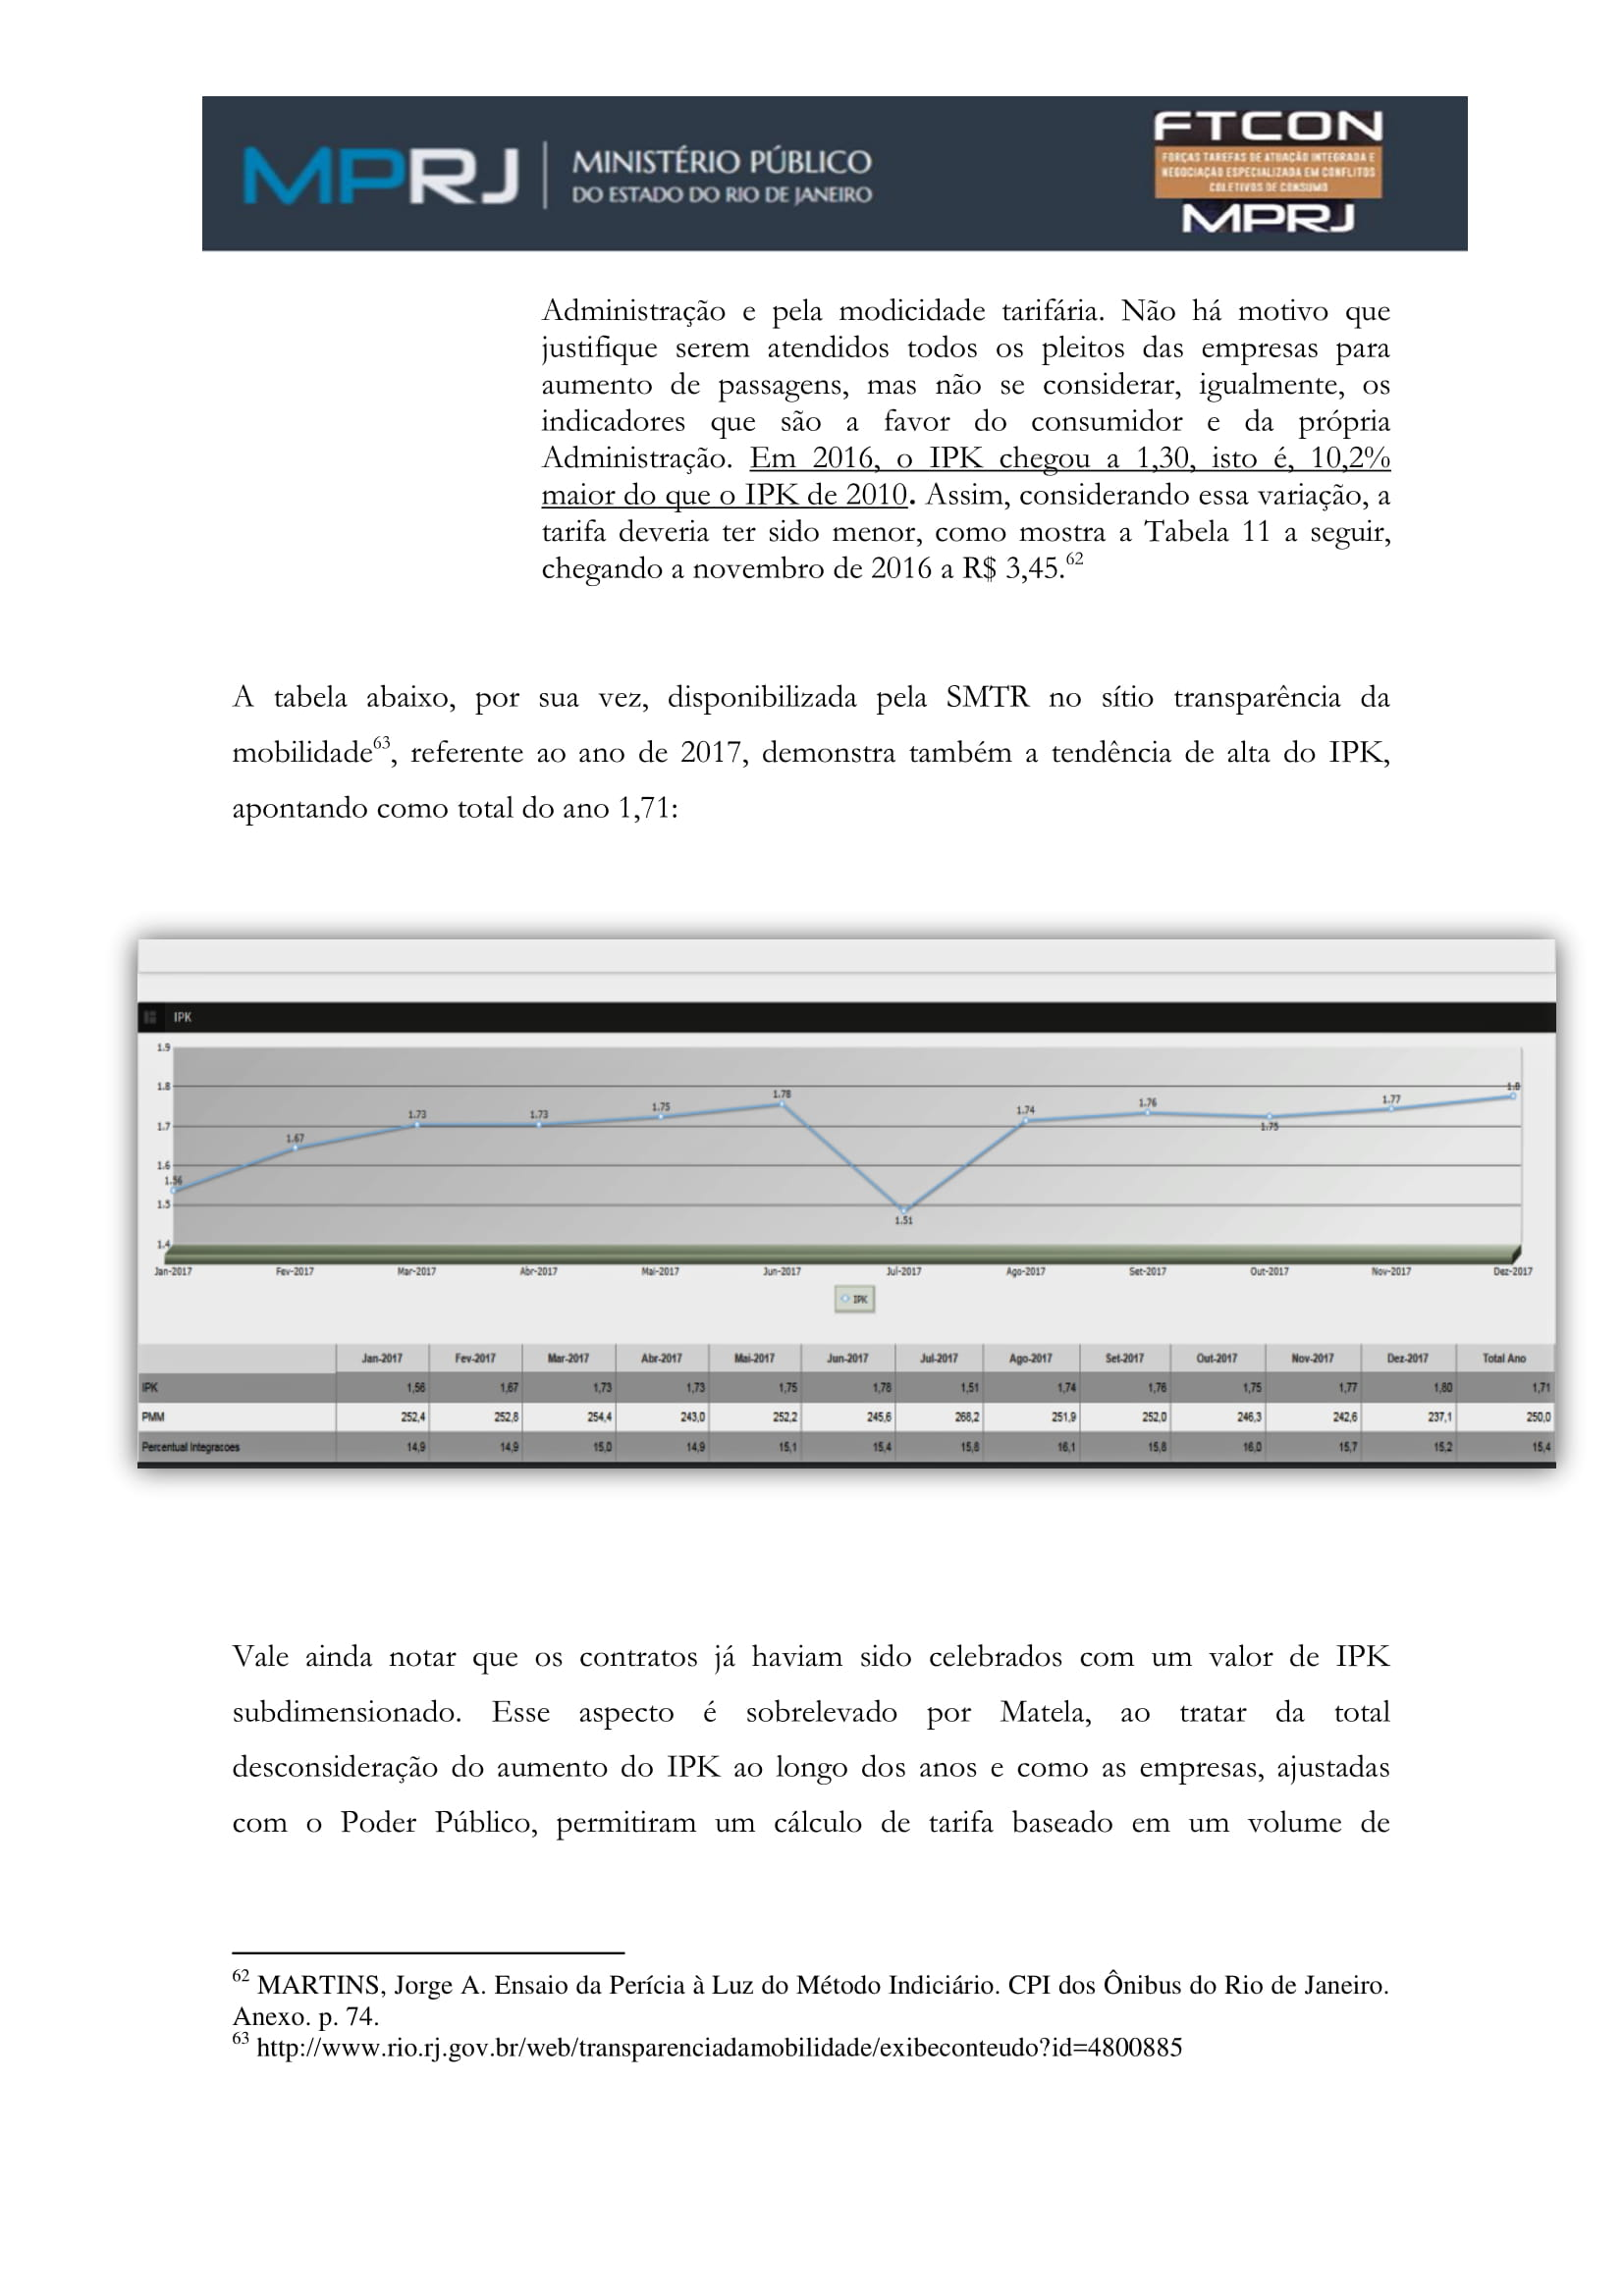 acp_caducidade_onibus_dr_rt-076